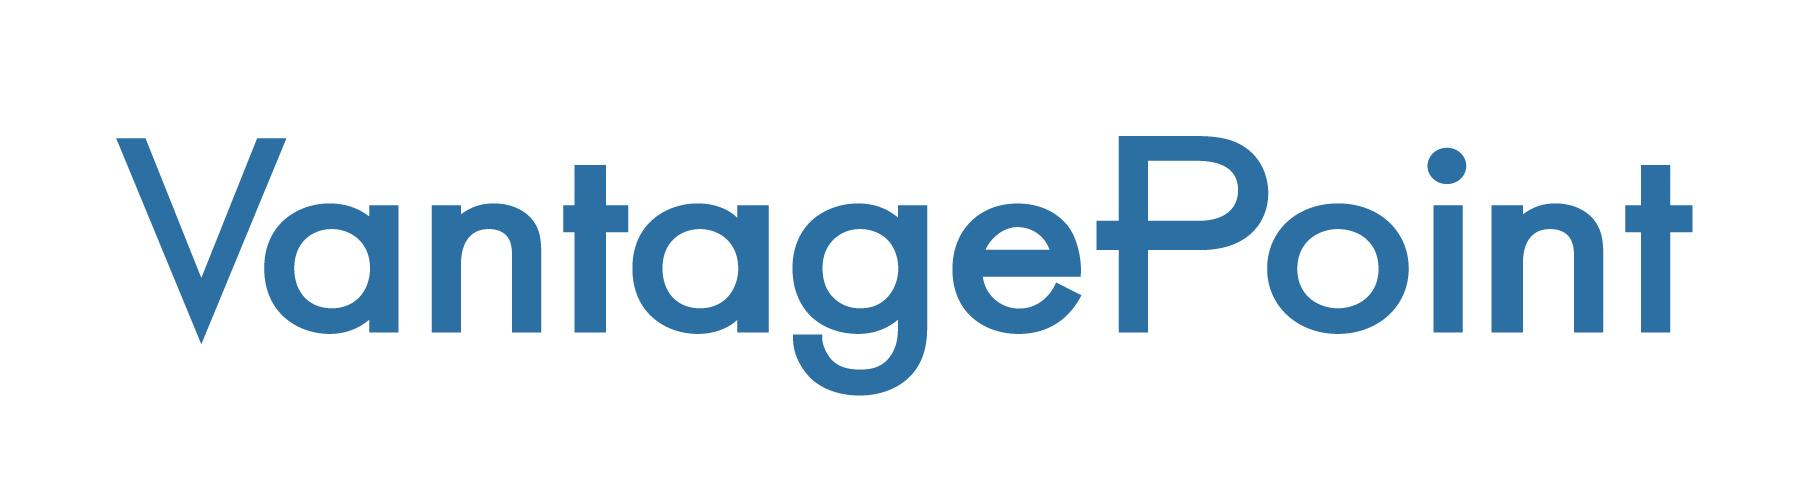 Vantagepoint AI, LLC Company Logo